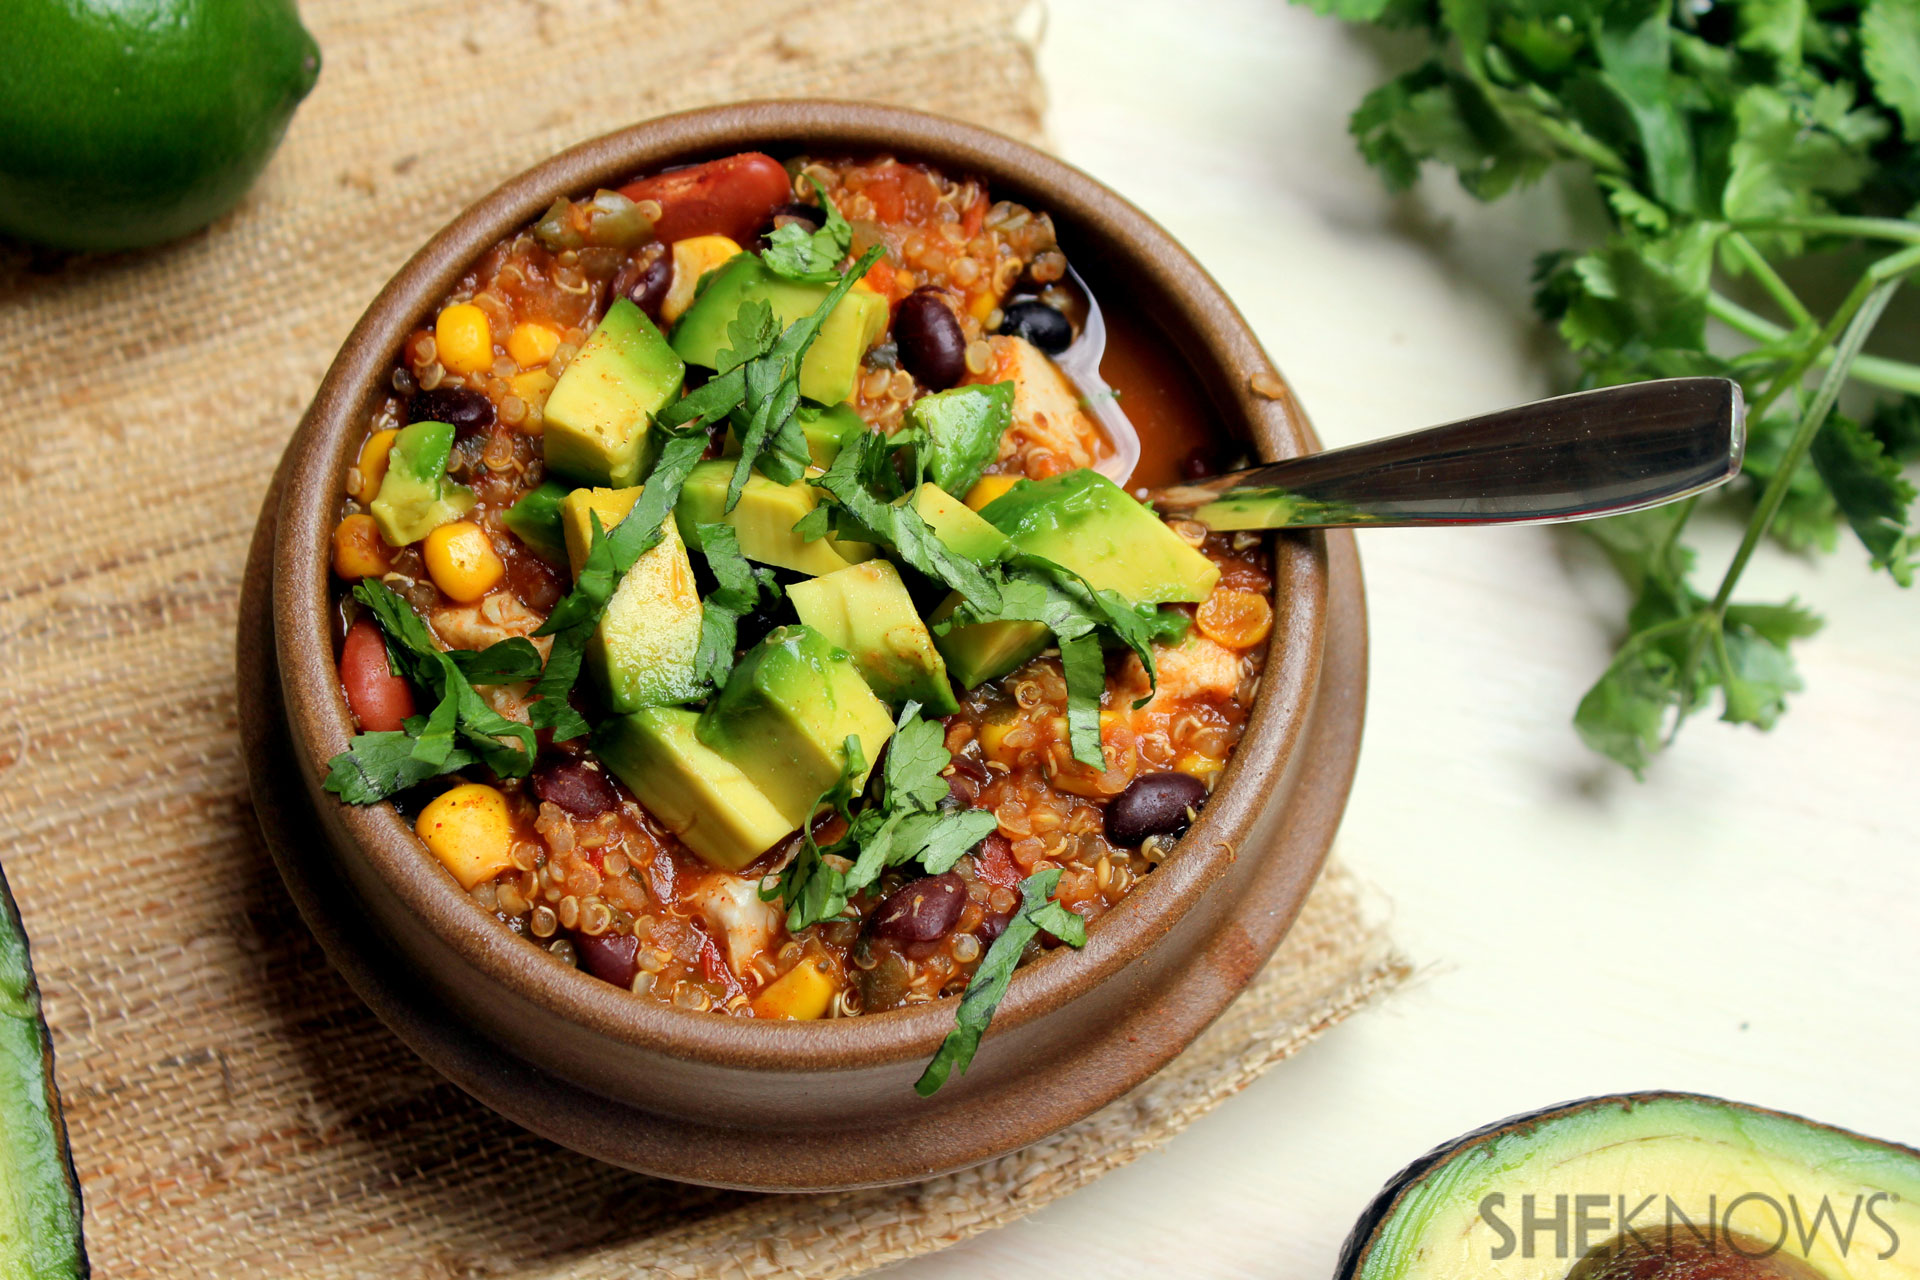 Chili recipe in under 30 minutes